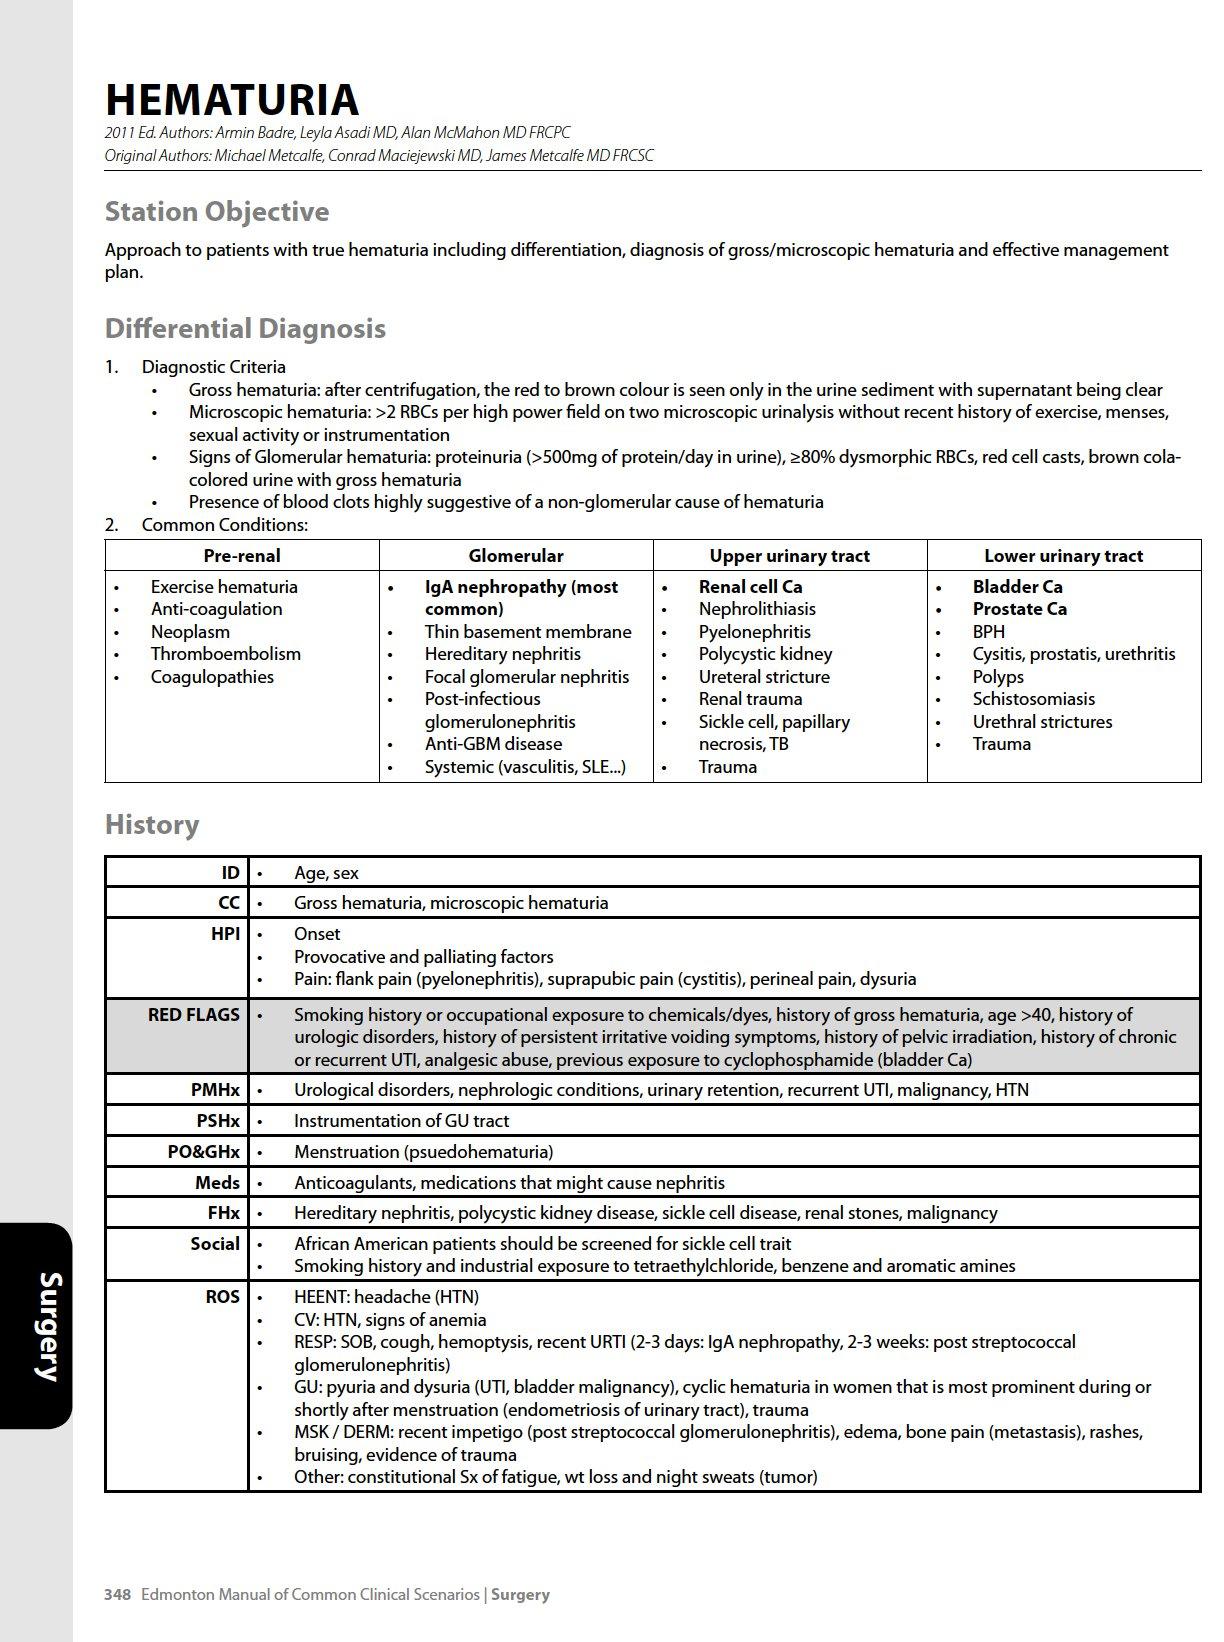 Approach to the osce the edmonton manual of common clinical approach to the osce the edmonton manual of common clinical scenarios 2011 edition text revision jasmine pawa david lesniak anthony lott fandeluxe Gallery